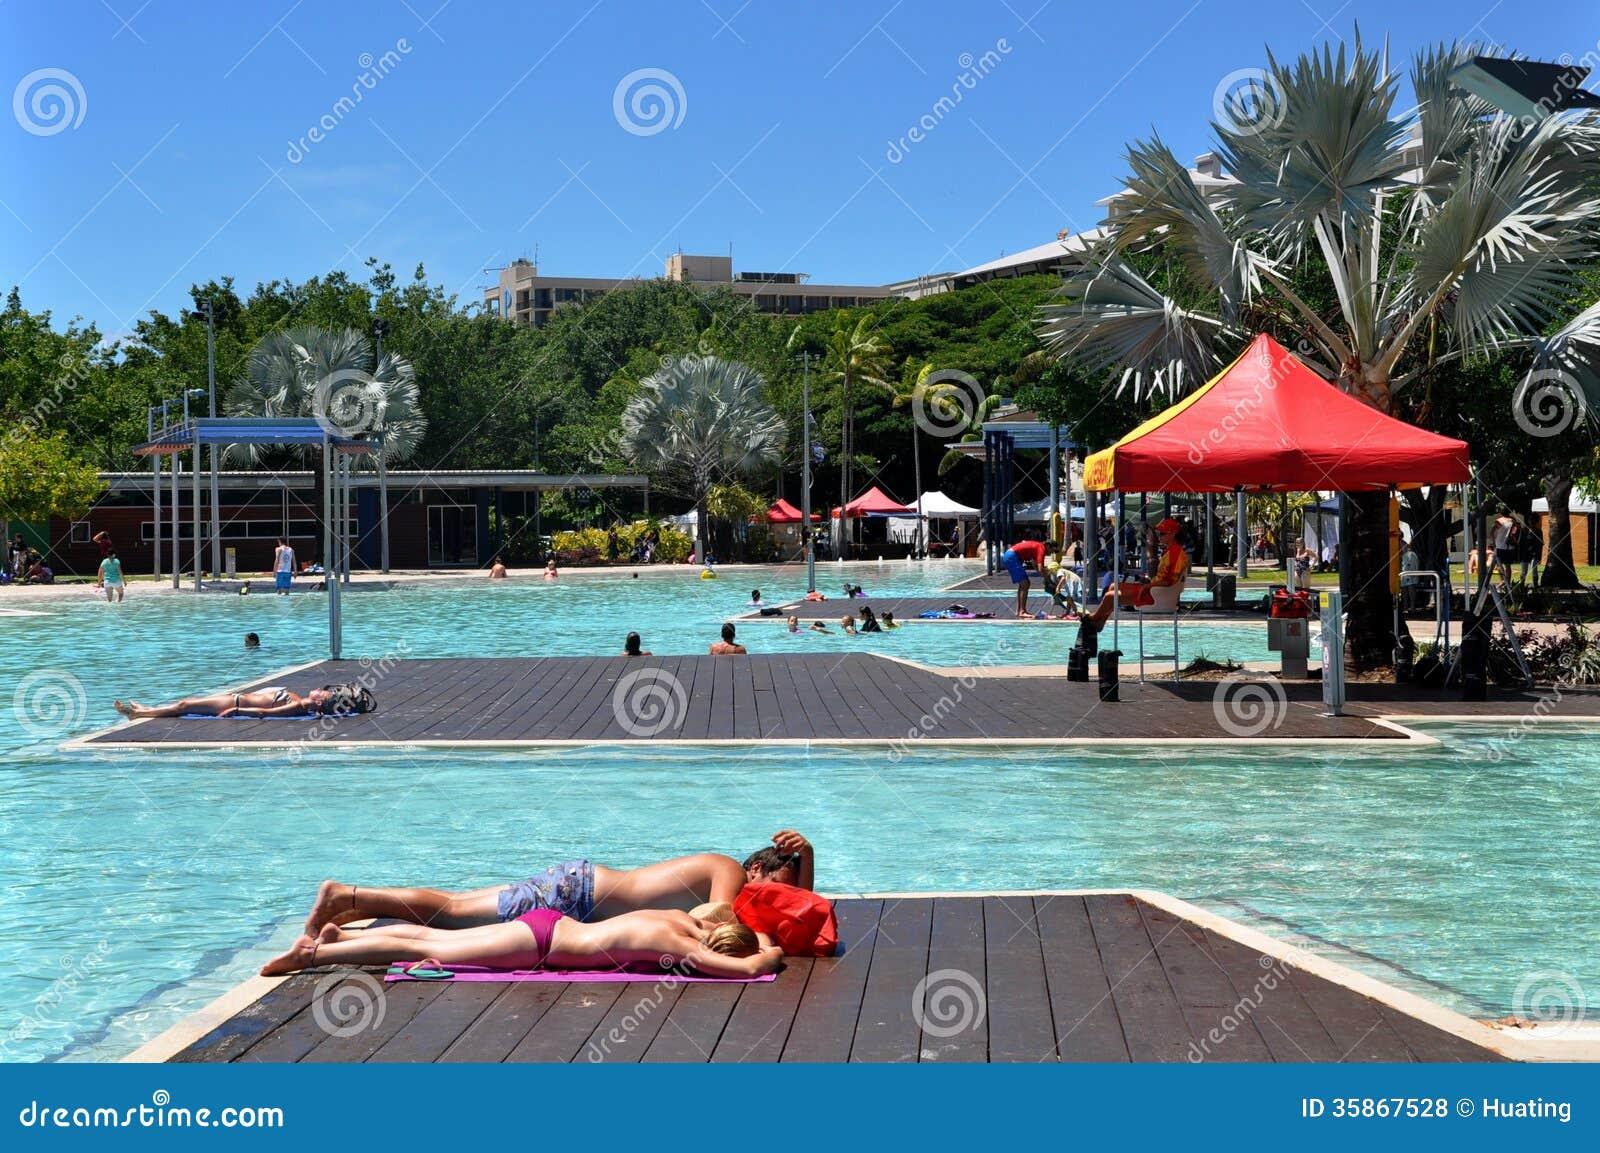 Cityscape Of Australia Swimming Pool Editorial Stock